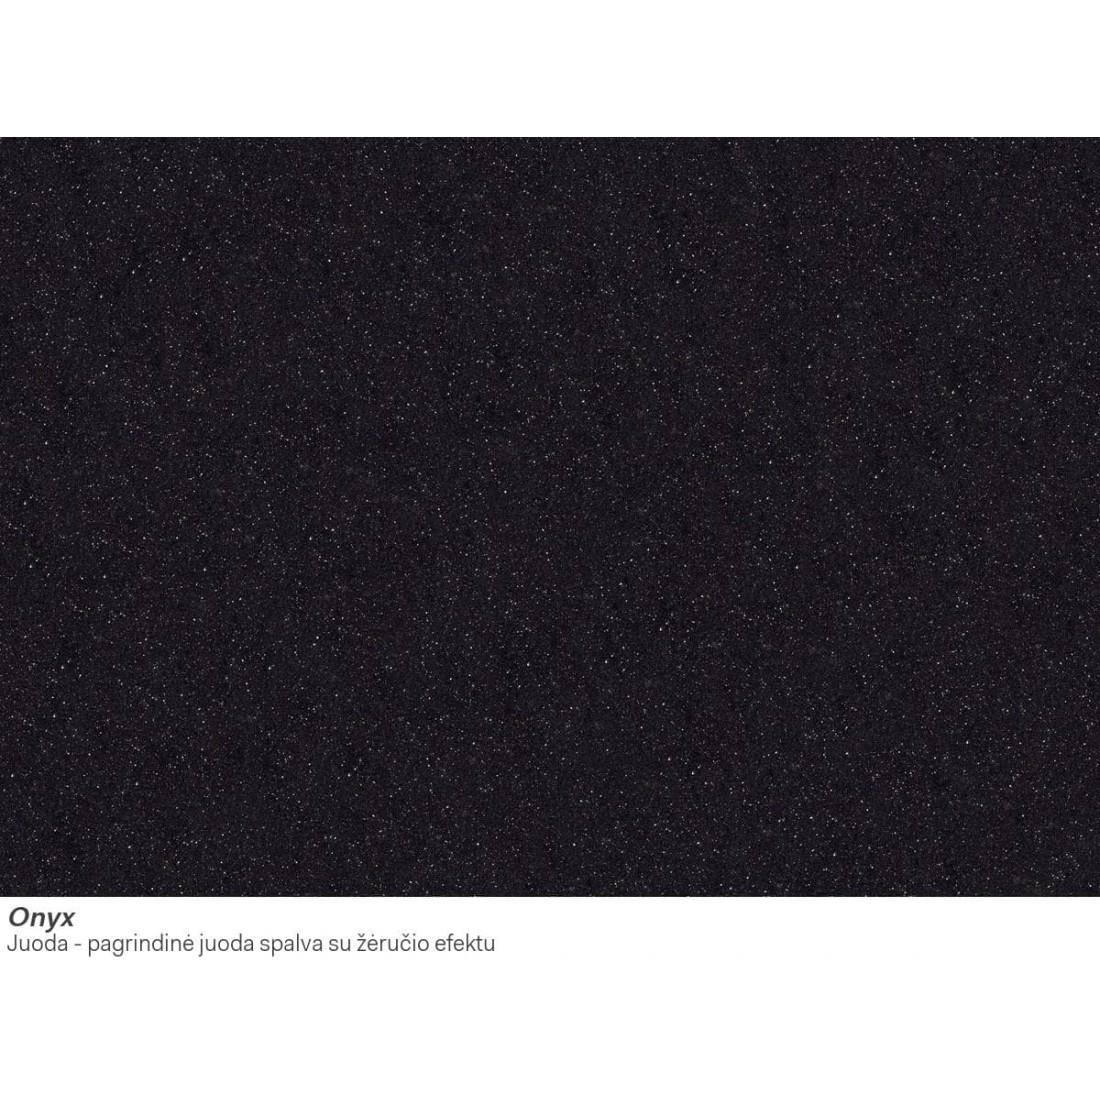 Akmens masės plautuvė Franke Mythos, MTG 651-100, Onyx, dubuo kairėje